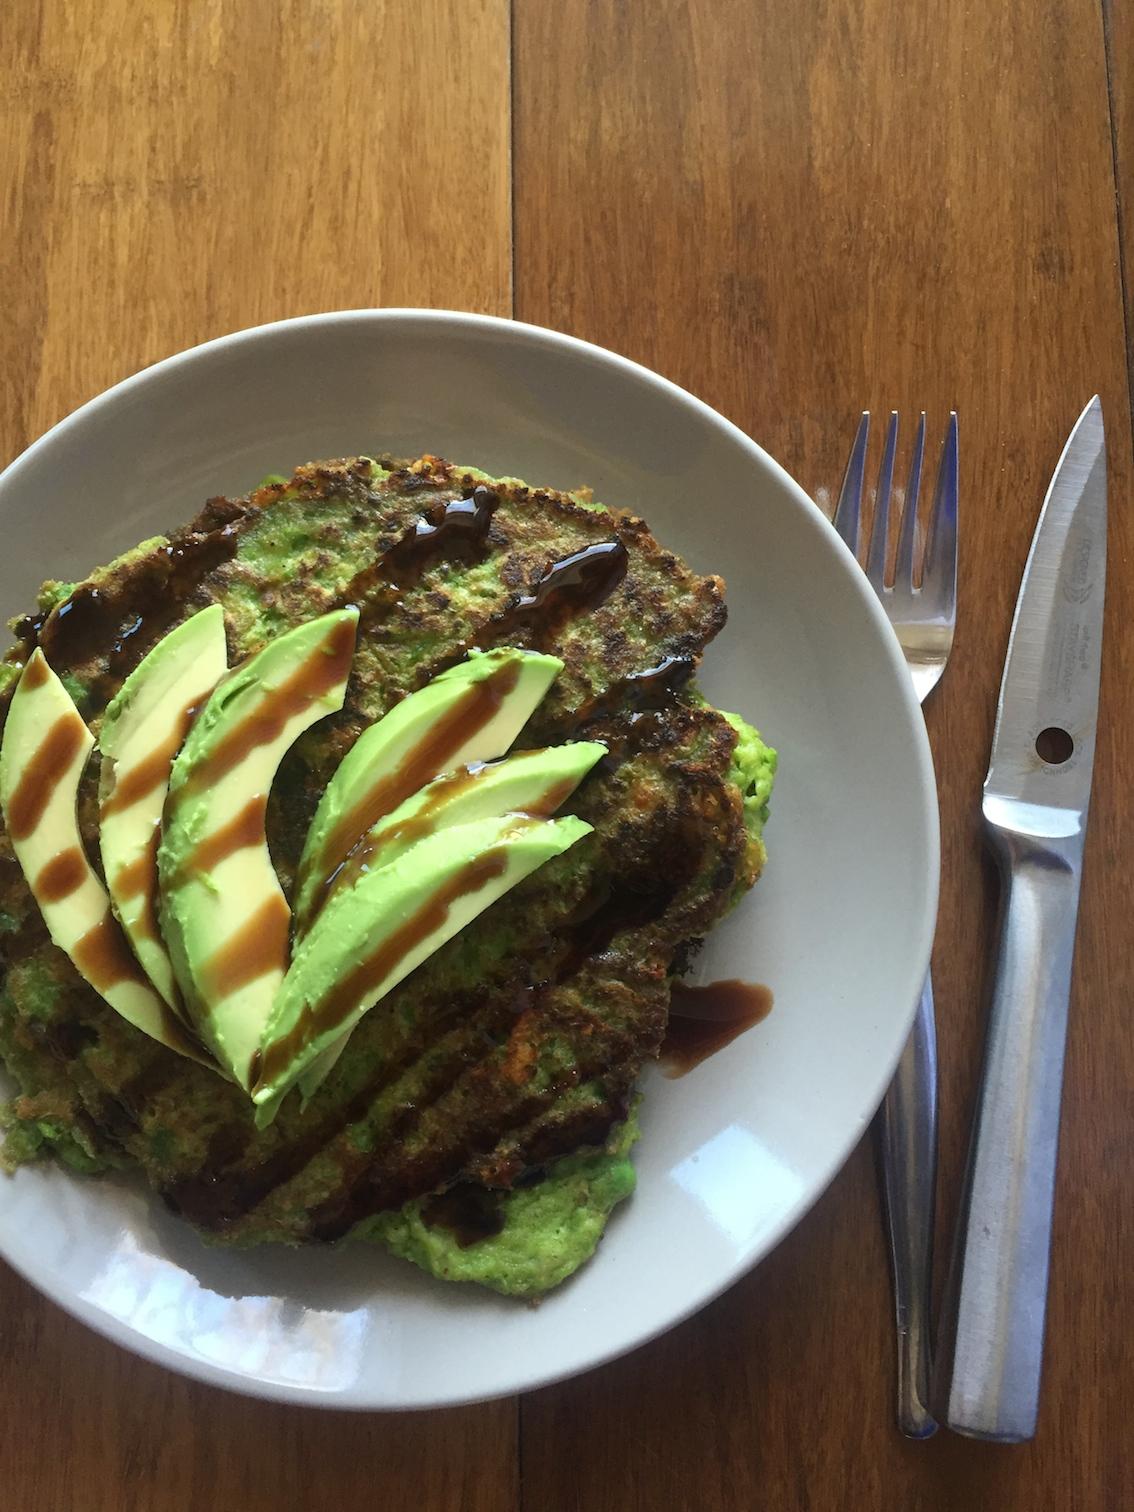 Delicious green pea pancakes